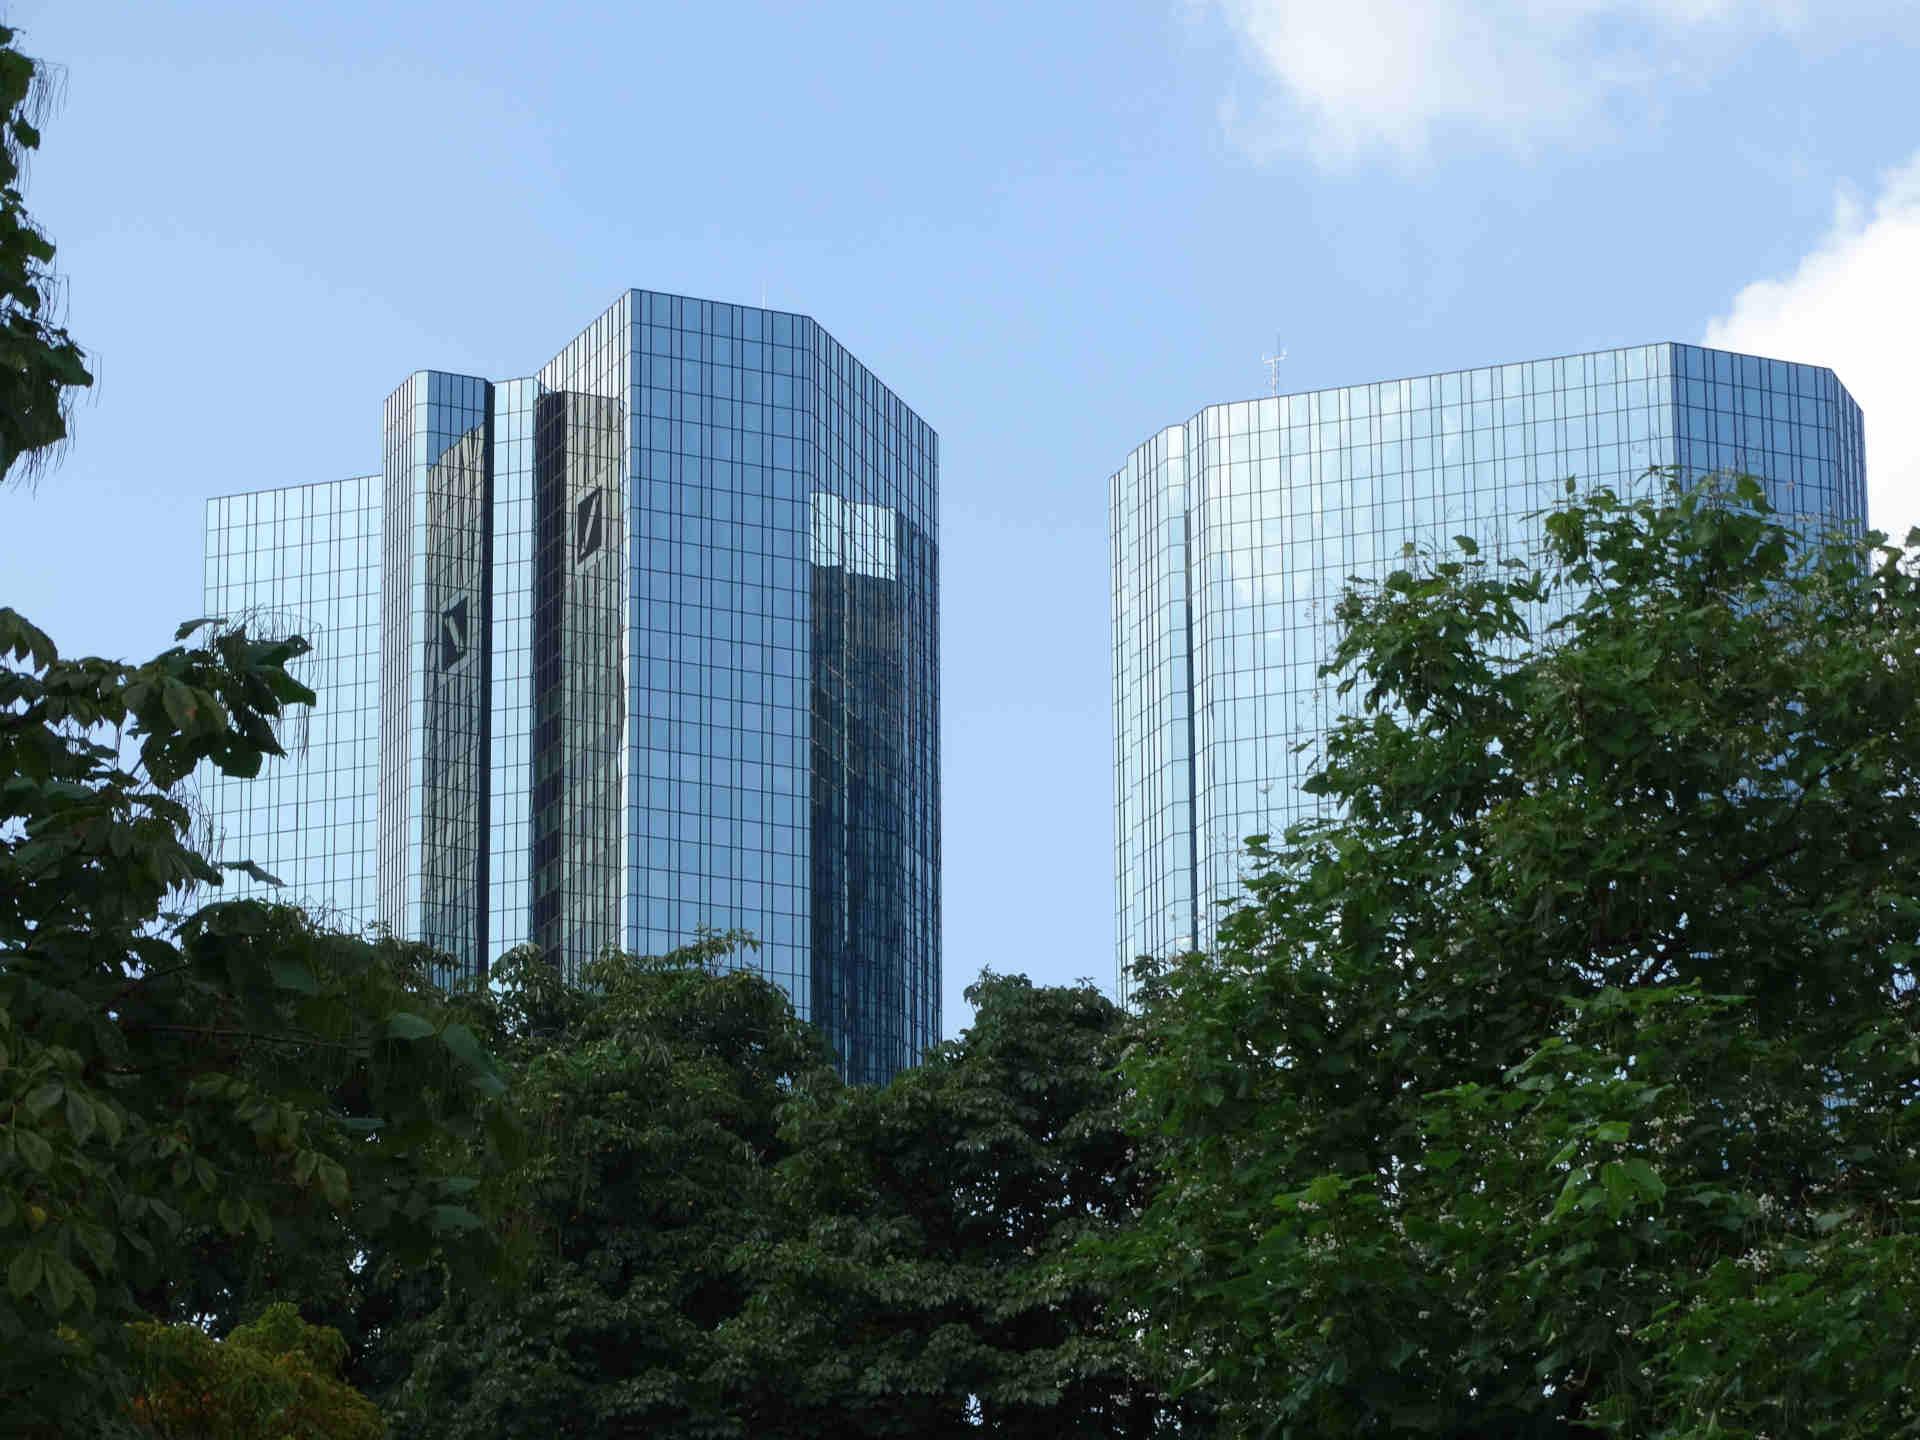 Erbnachweisklauseln in Bank-AGBs